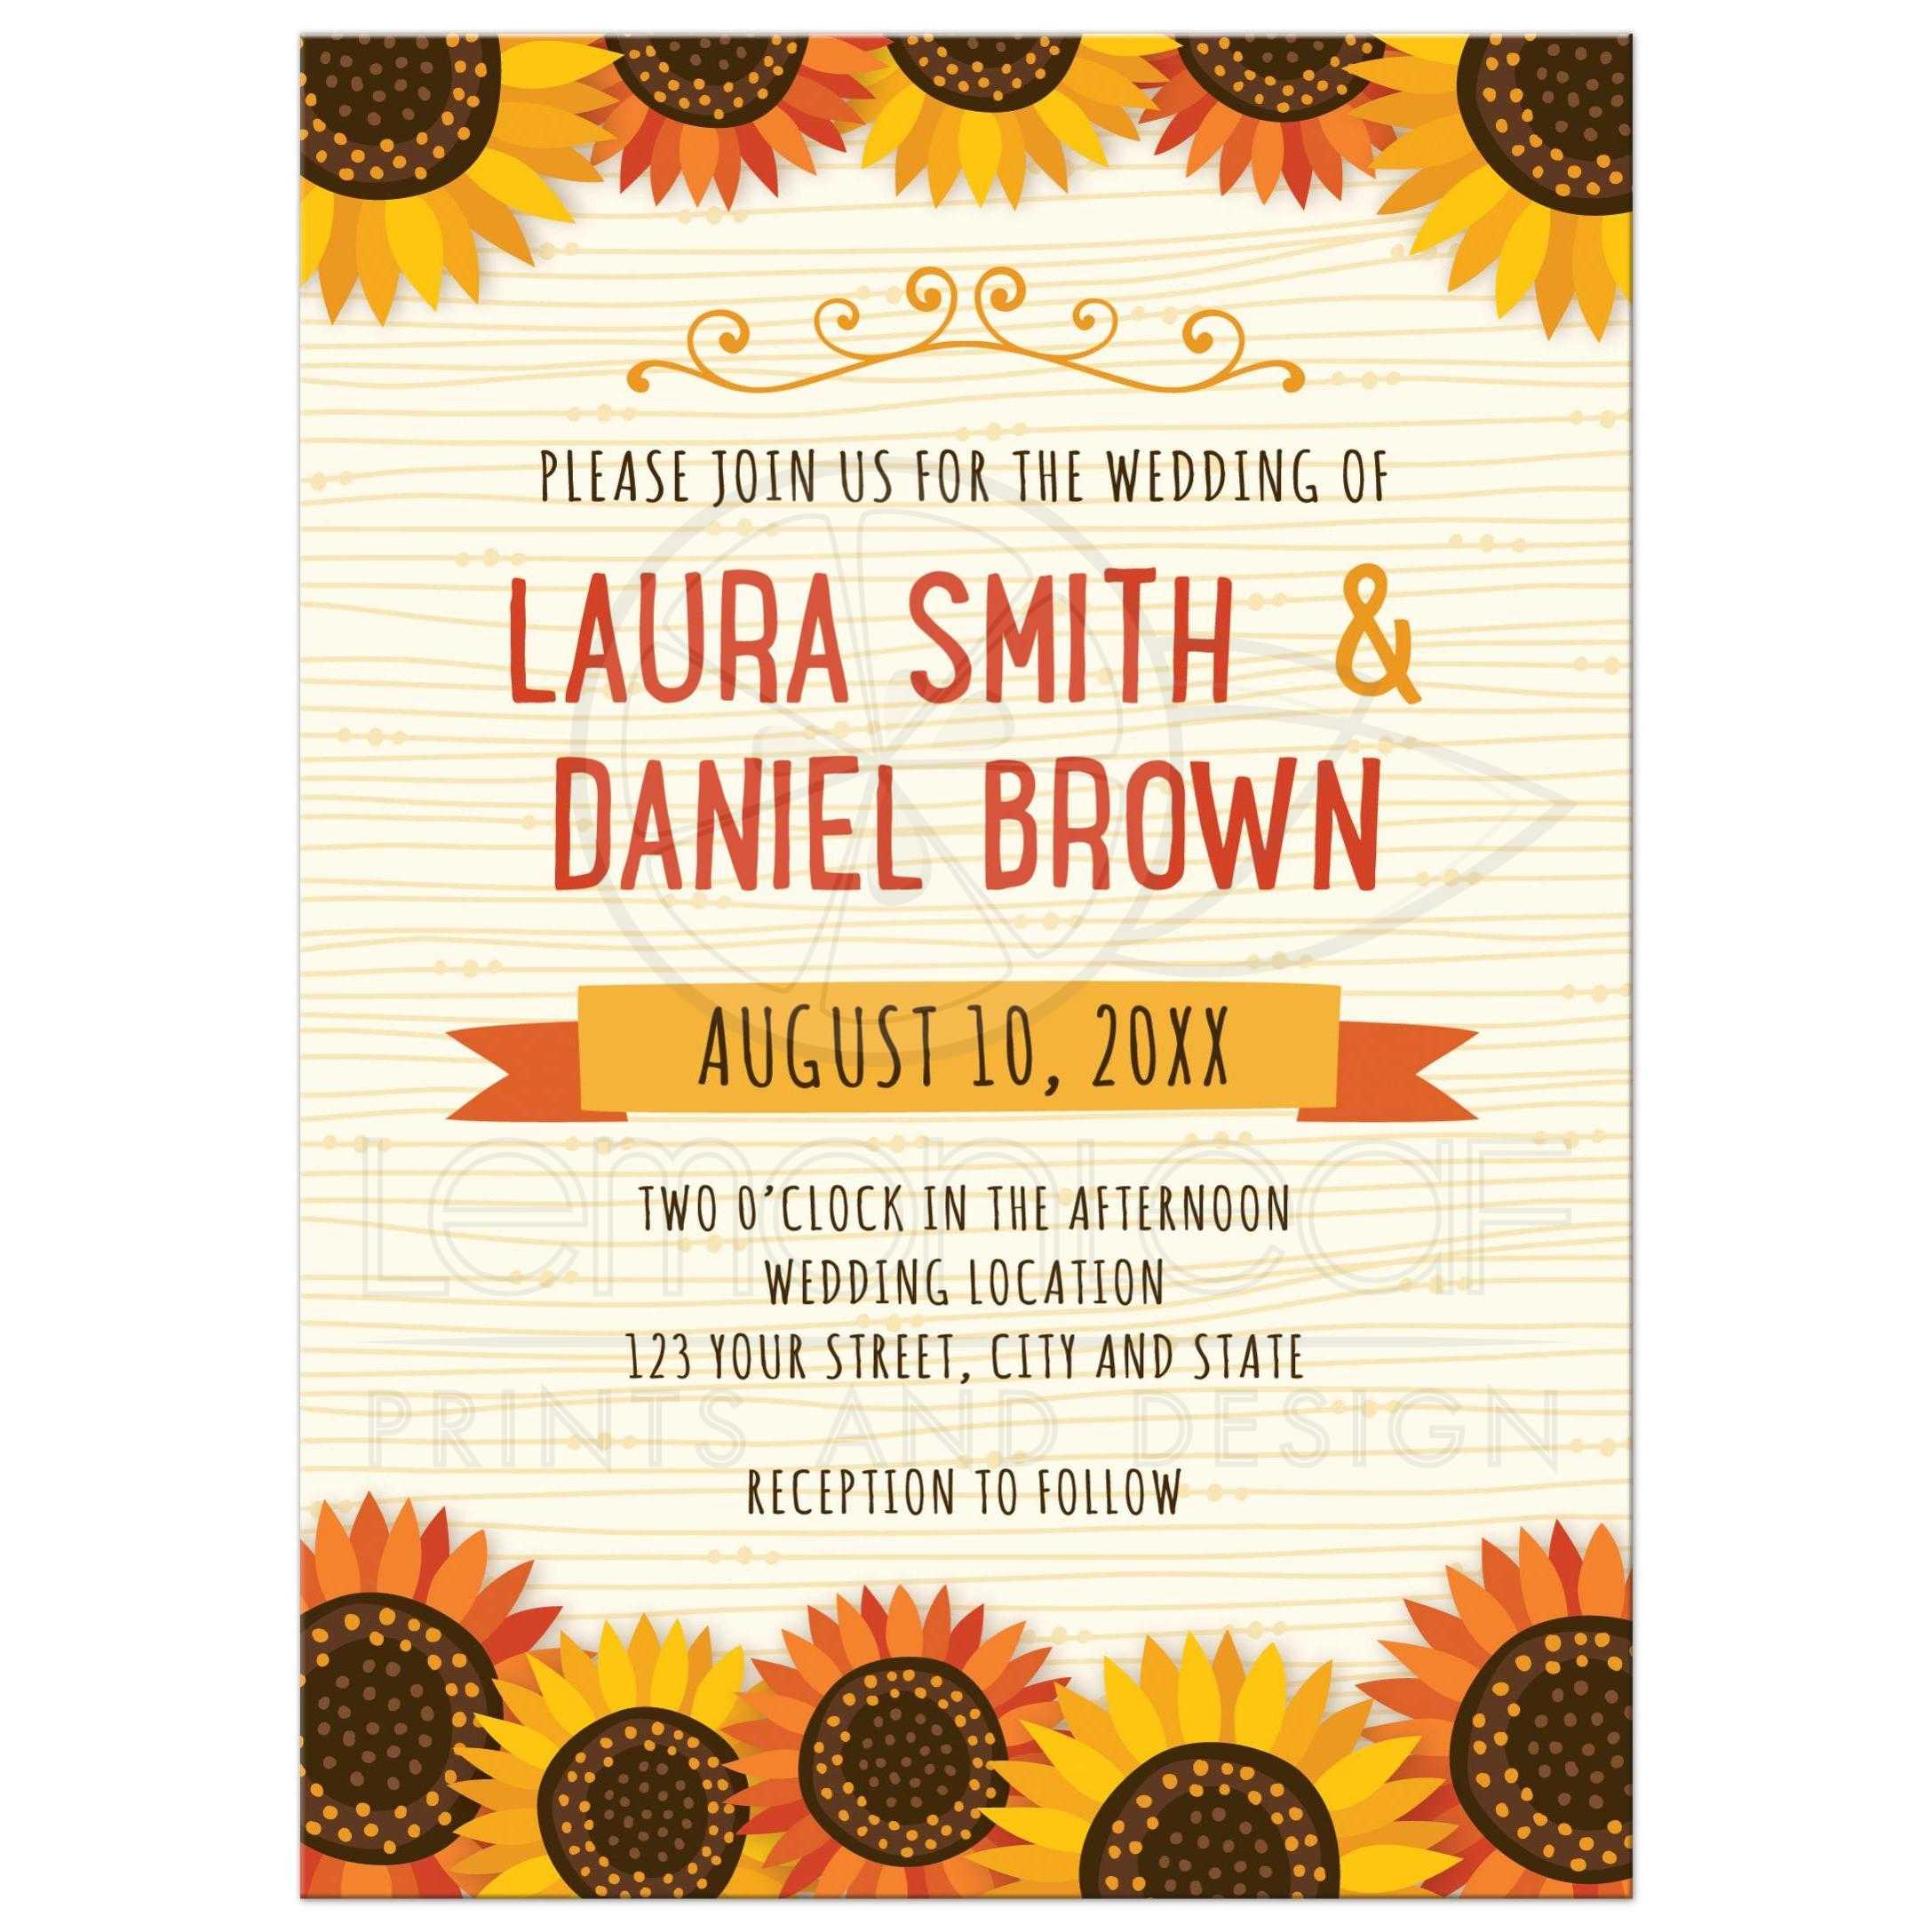 Whimsical sunflowers on wood illustration background – Sunflower Wedding Invite